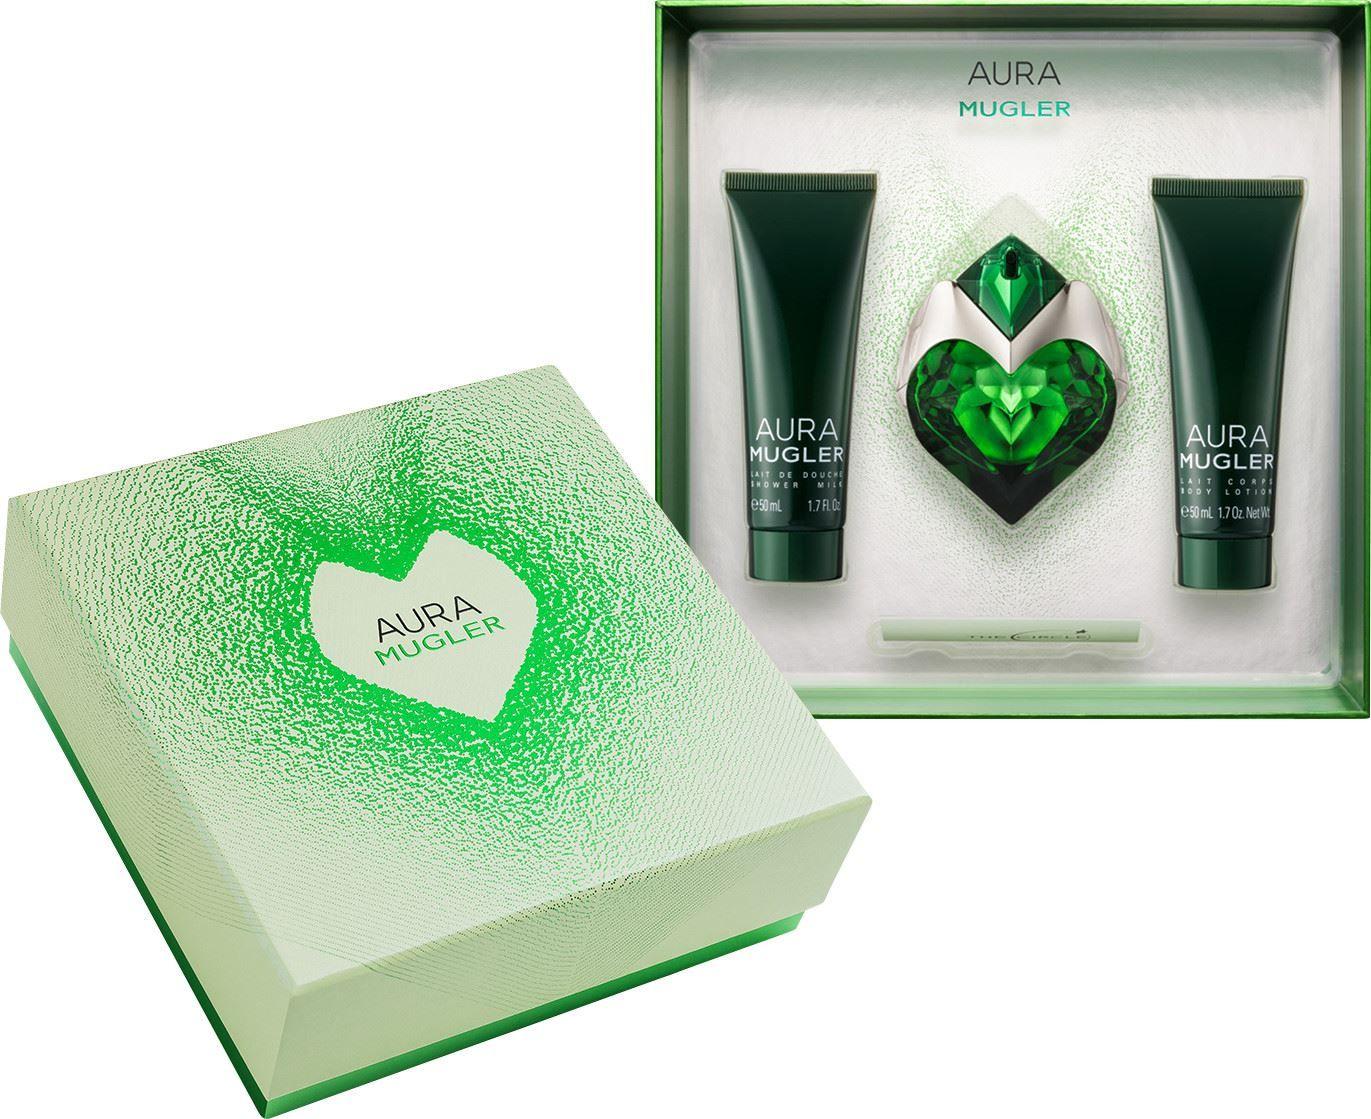 Thierry Mugler Aura Gift Set 30ml Eau